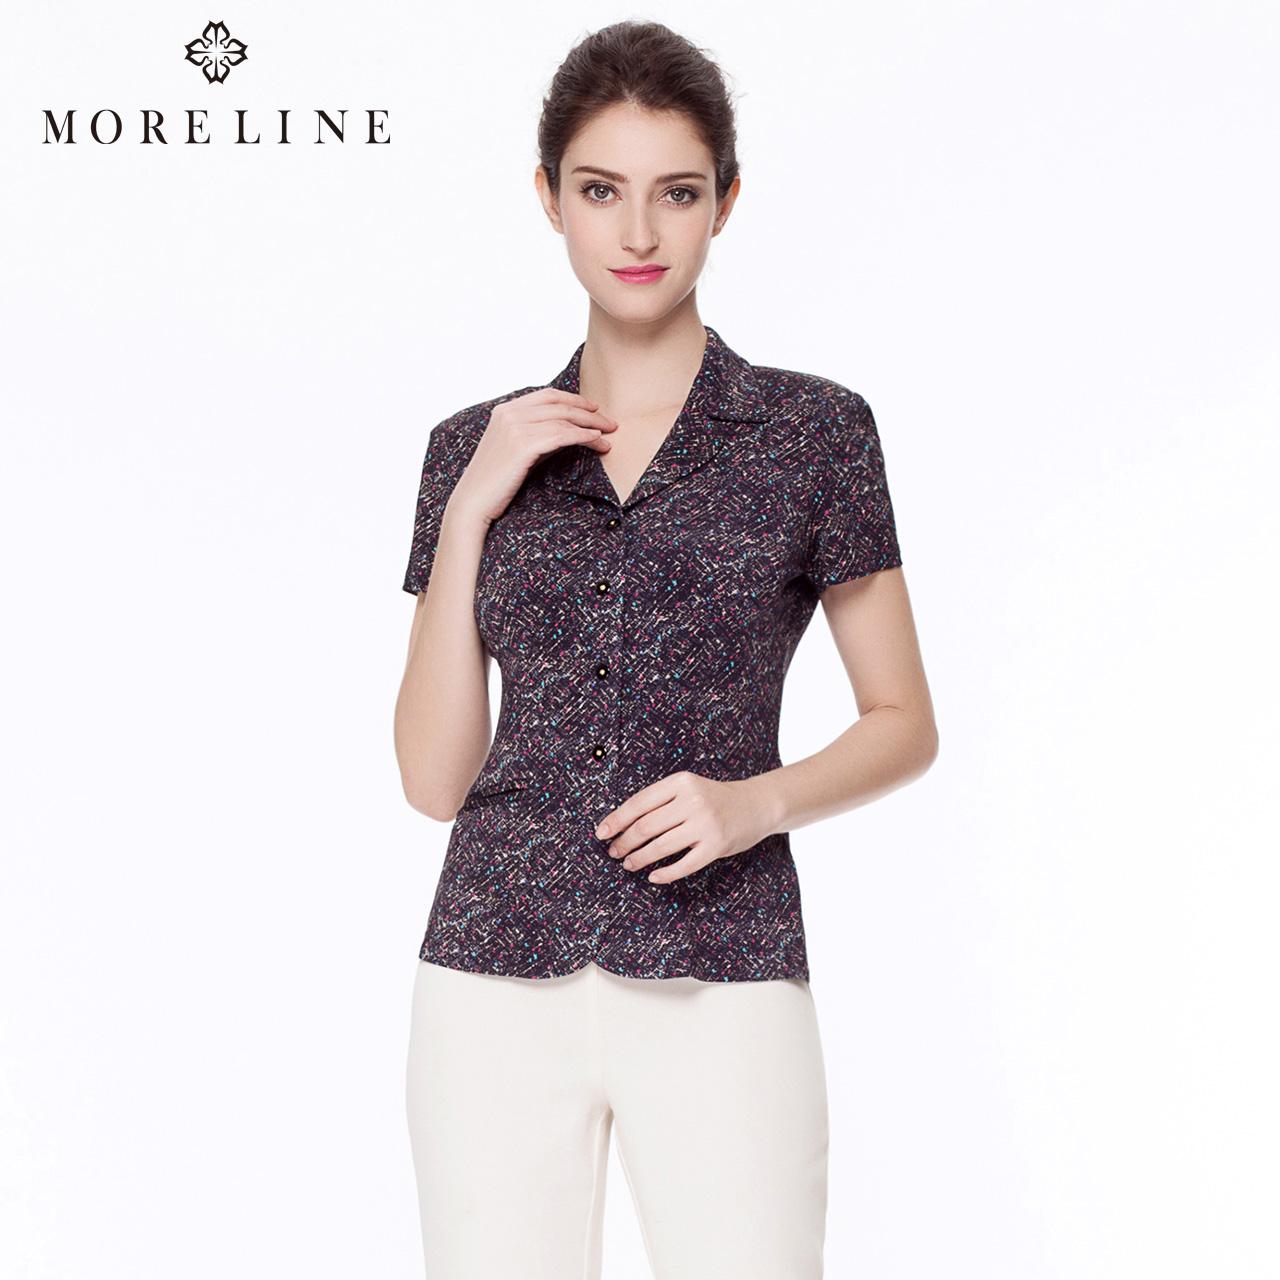 MORELINE沐兰正品春夏季女装 优雅时尚修身气质 翻领印花短袖衬衫